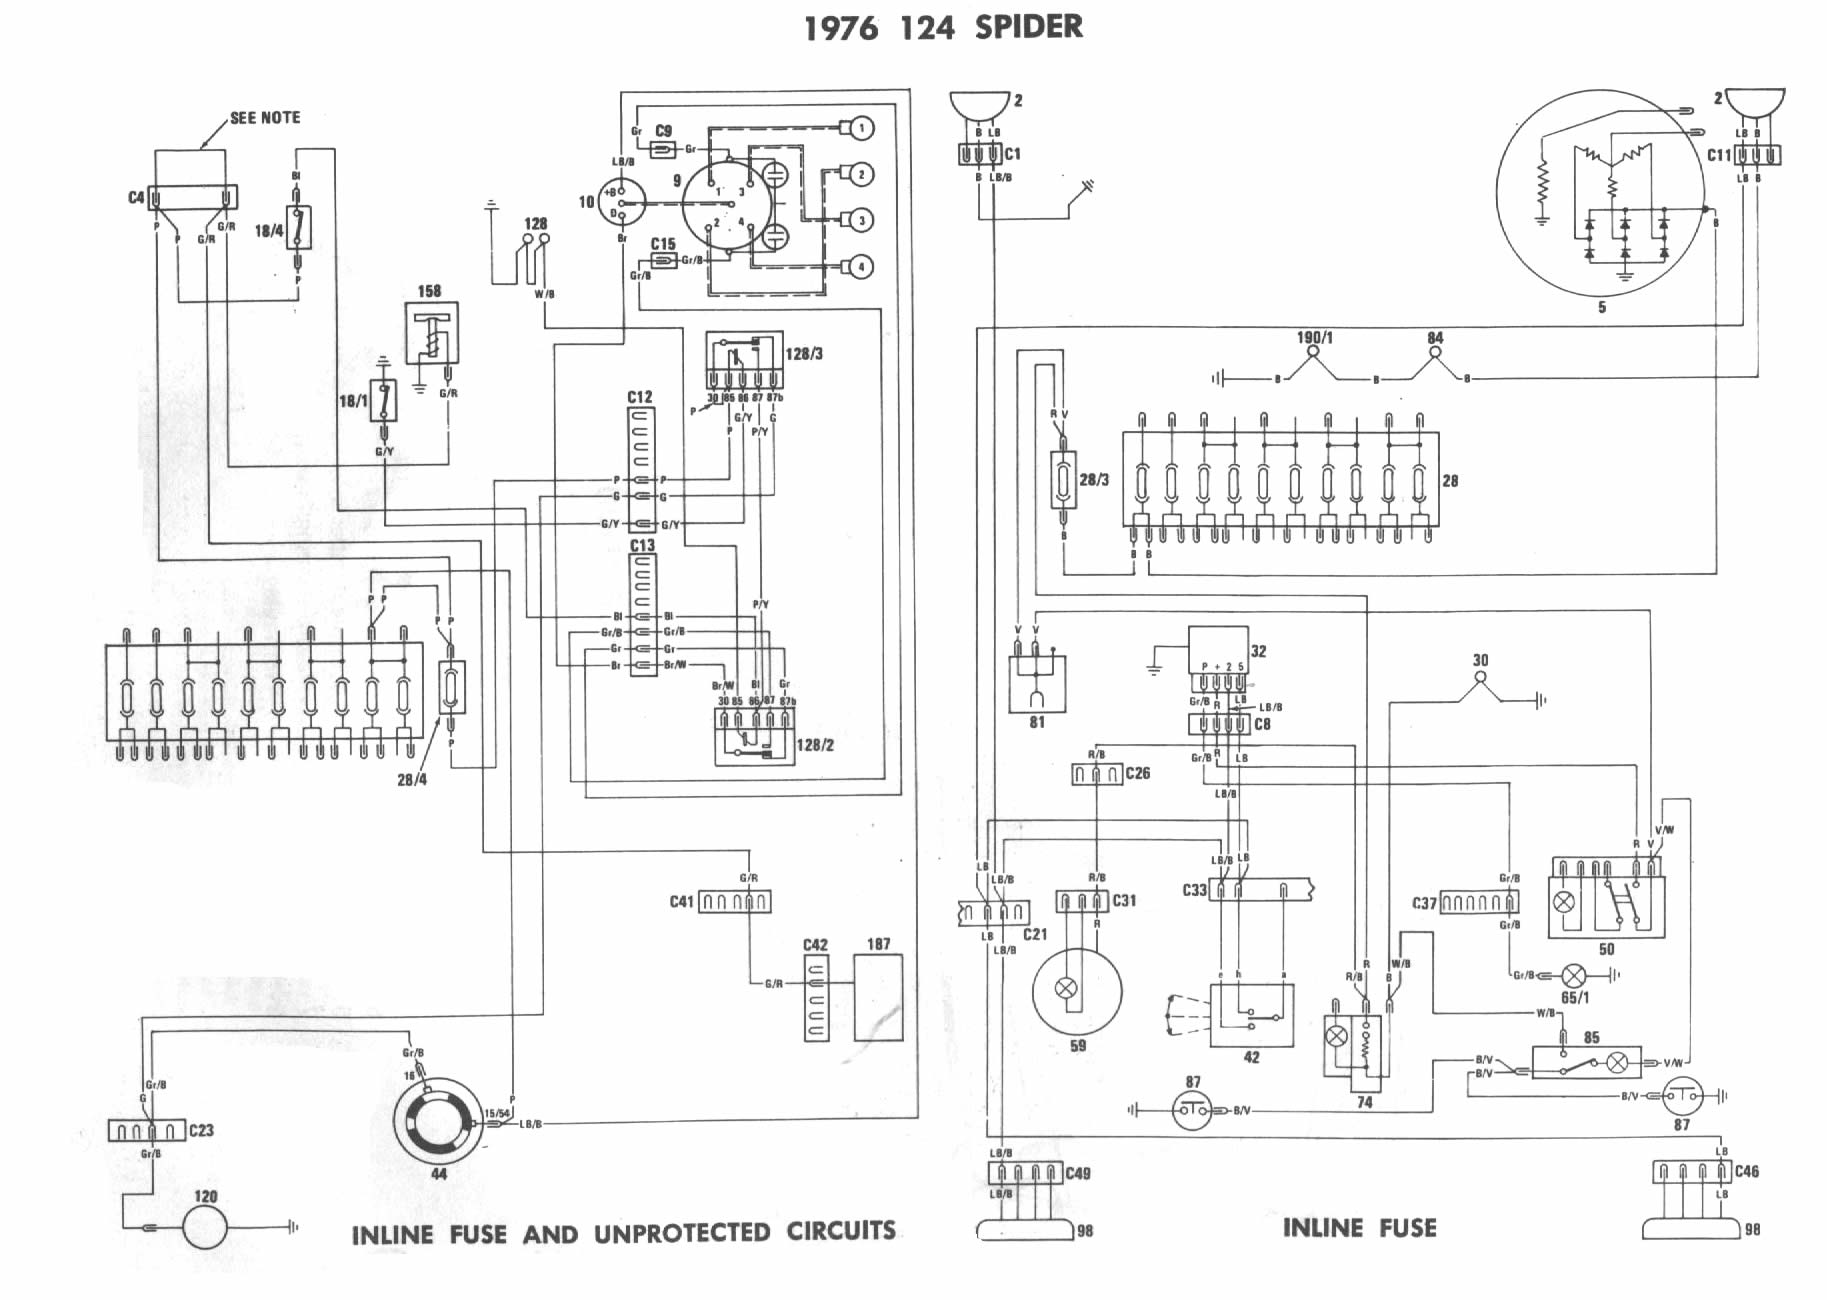 fiat scudo wiring diagram enthusiast wiring diagrams u2022 rh rasalibre co fiat scudo radio wiring diagram fiat scudo wiring diagram free